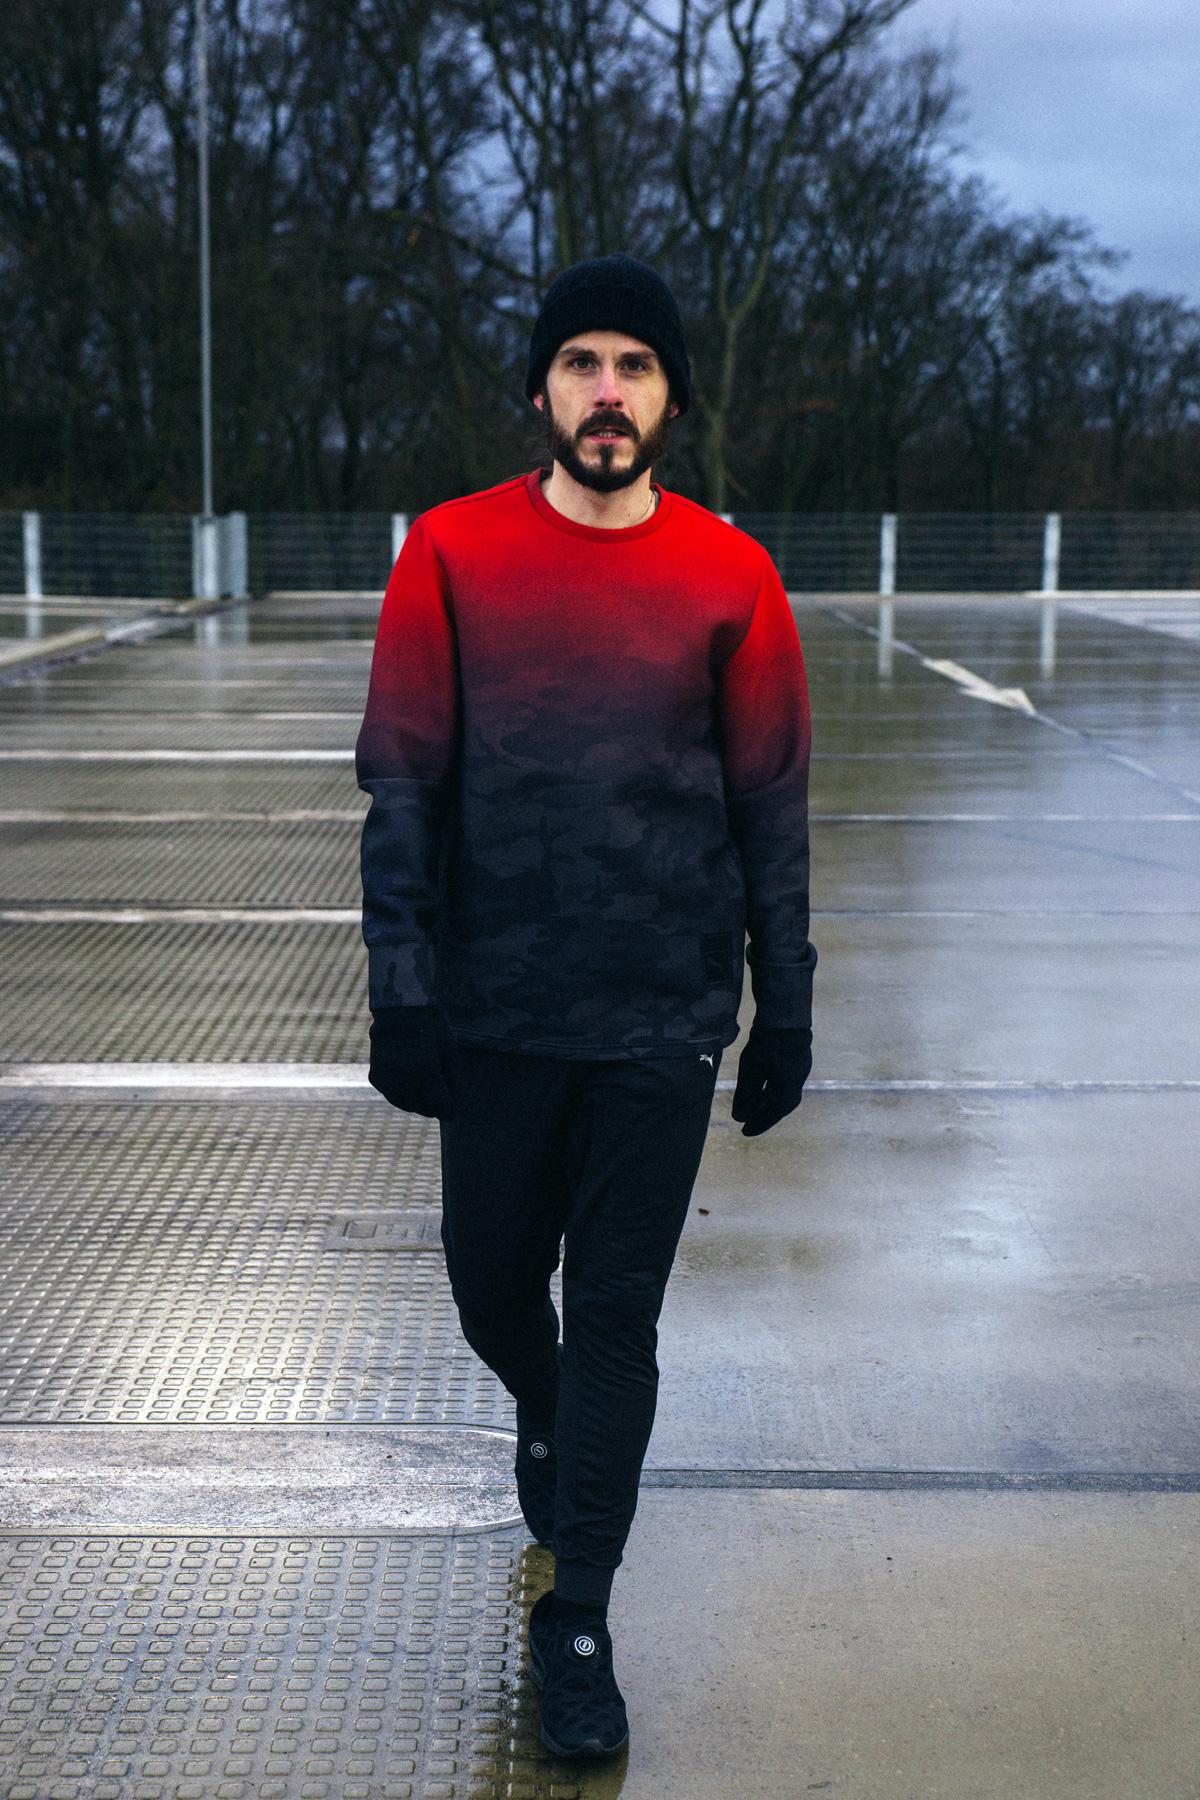 Outfit-Sport-Running-Outdoorfitness-Streetstyle-Puma-Trapstar-Fashionblog